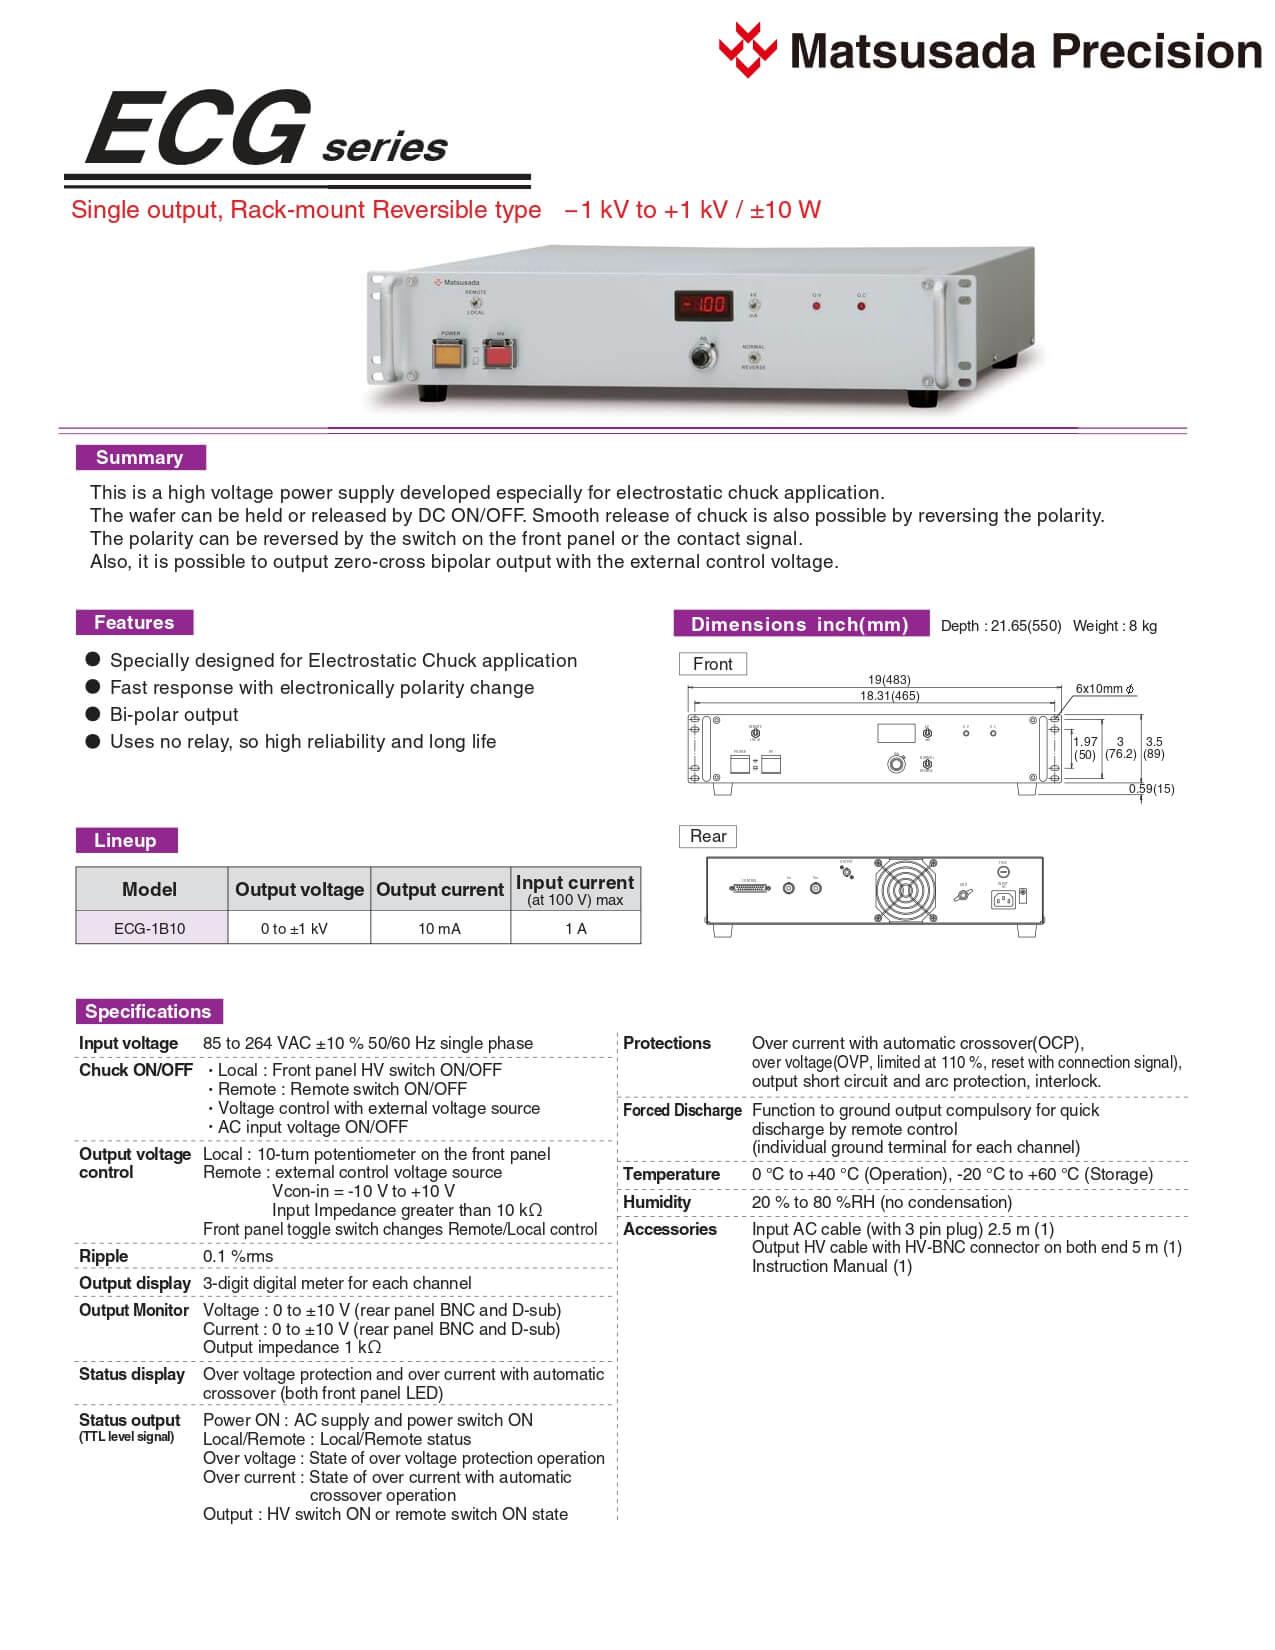 ECG series Datasheet